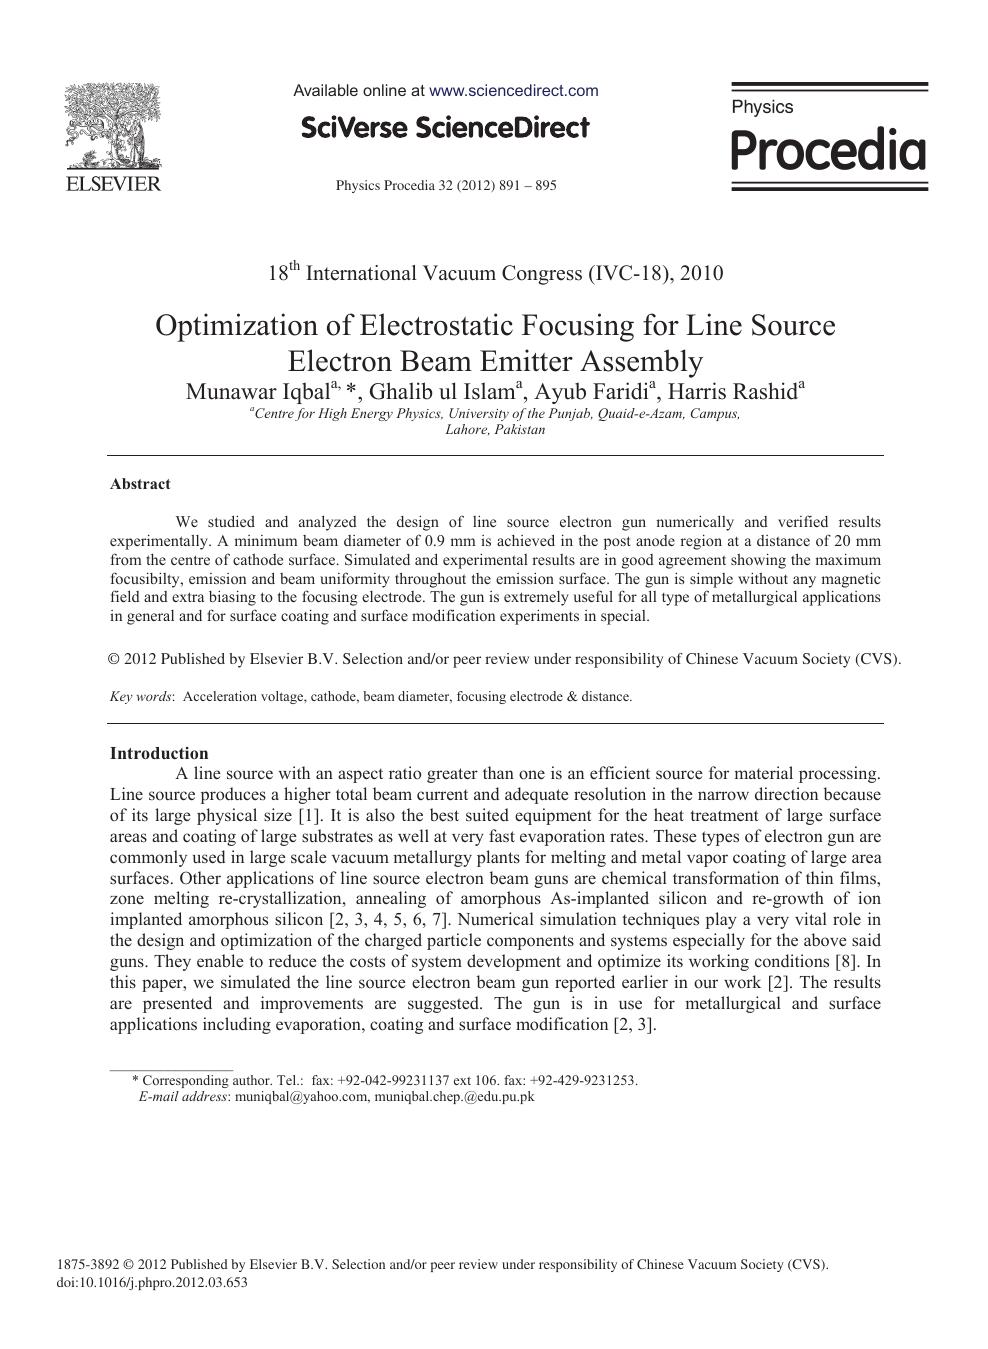 Optimization of Electrostatic Focusing for Line Source